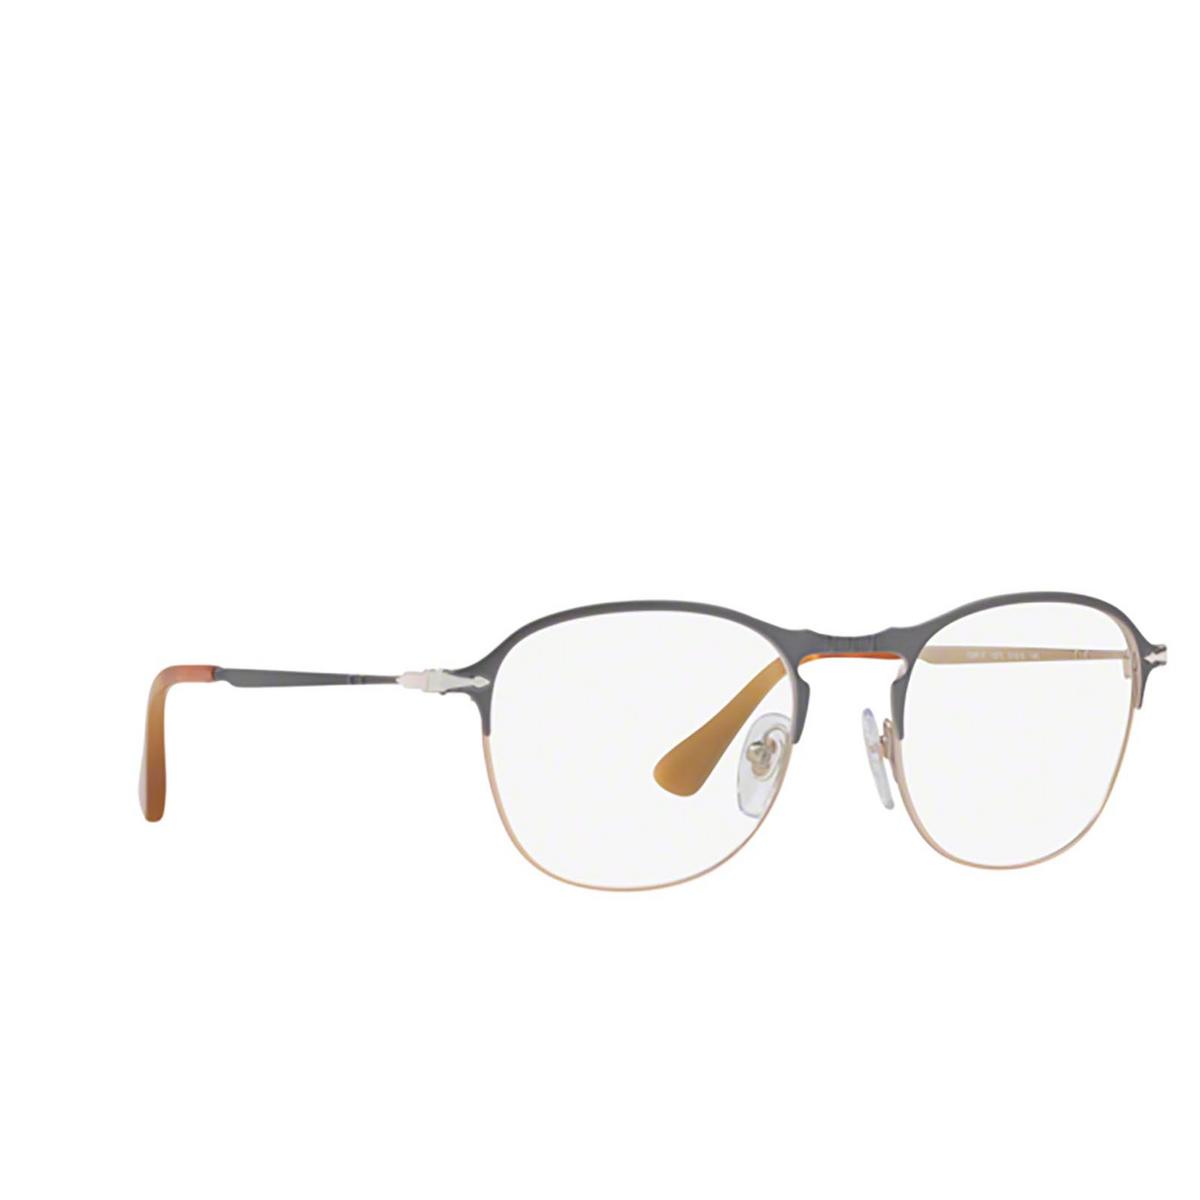 Persol® Square Eyeglasses: PO7007V color Grey / Light Brown 1071 - three-quarters view.